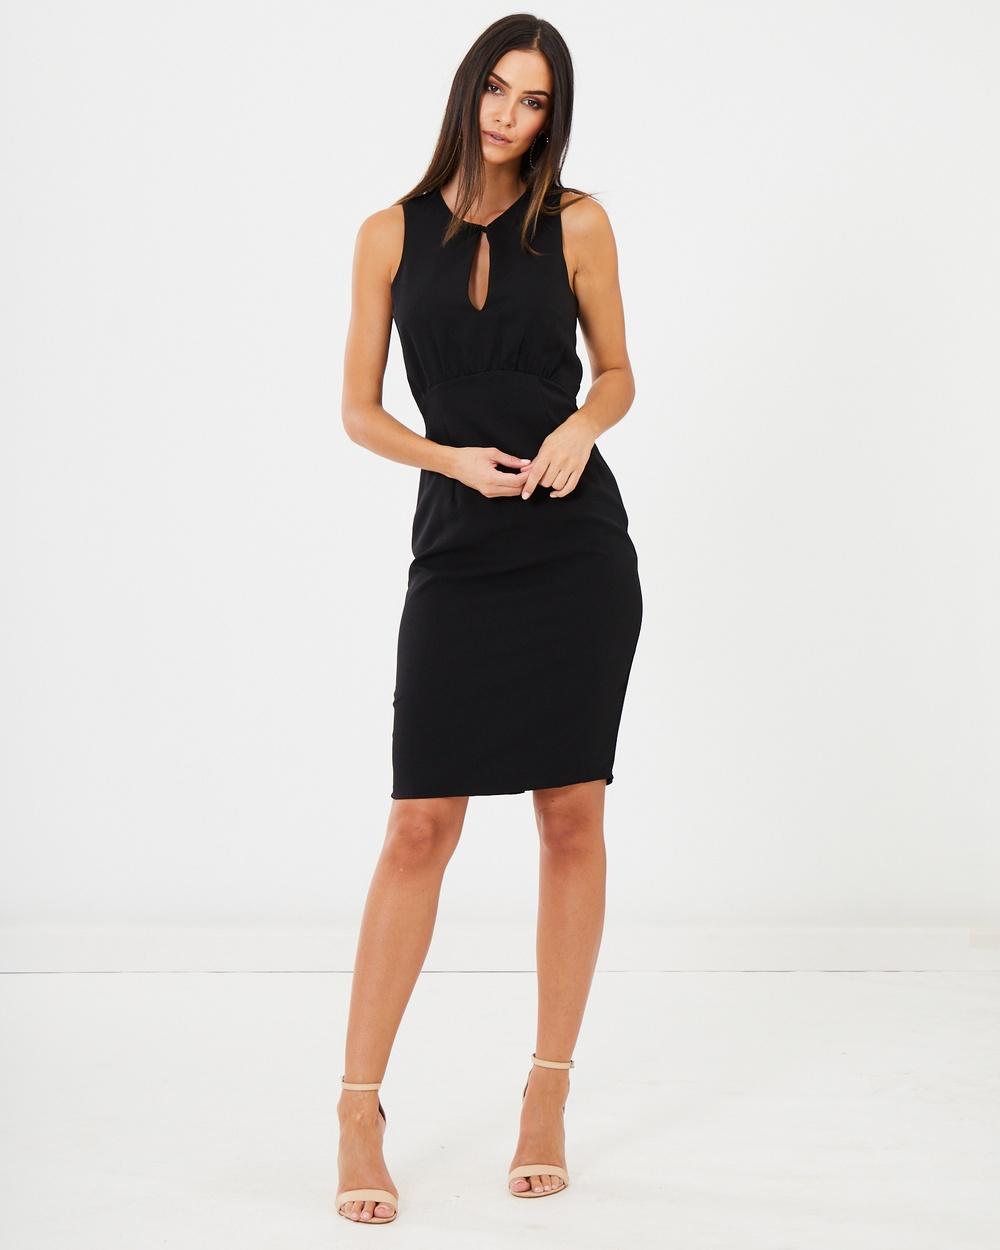 Photo of Tussah Black Amanda Dress - beautiful dress from Tussah online